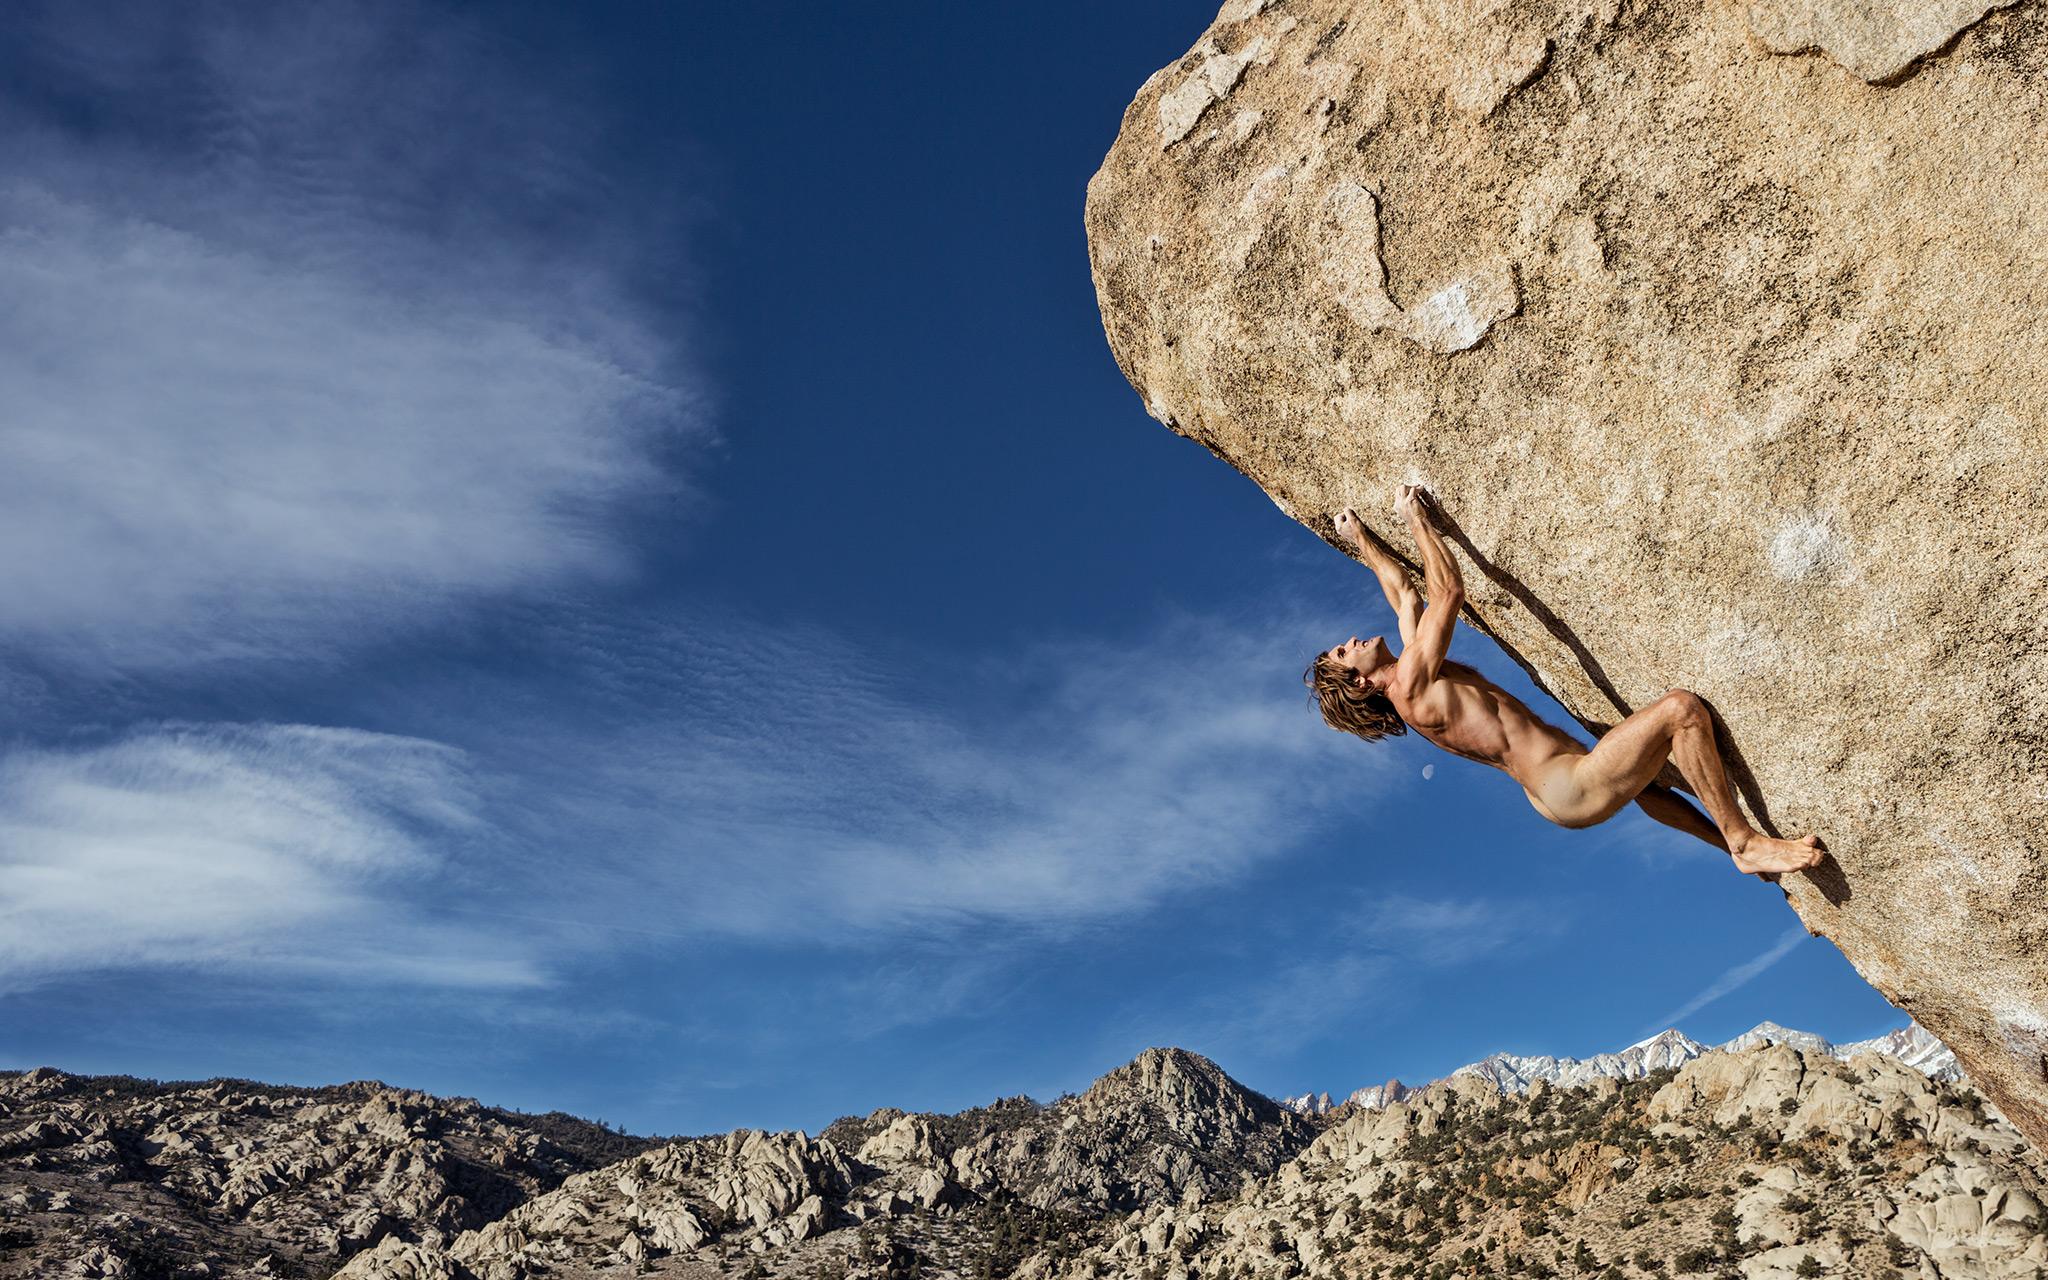 Climber Nation grab a seat its Chris Sharma Nude Alert 2048x1280